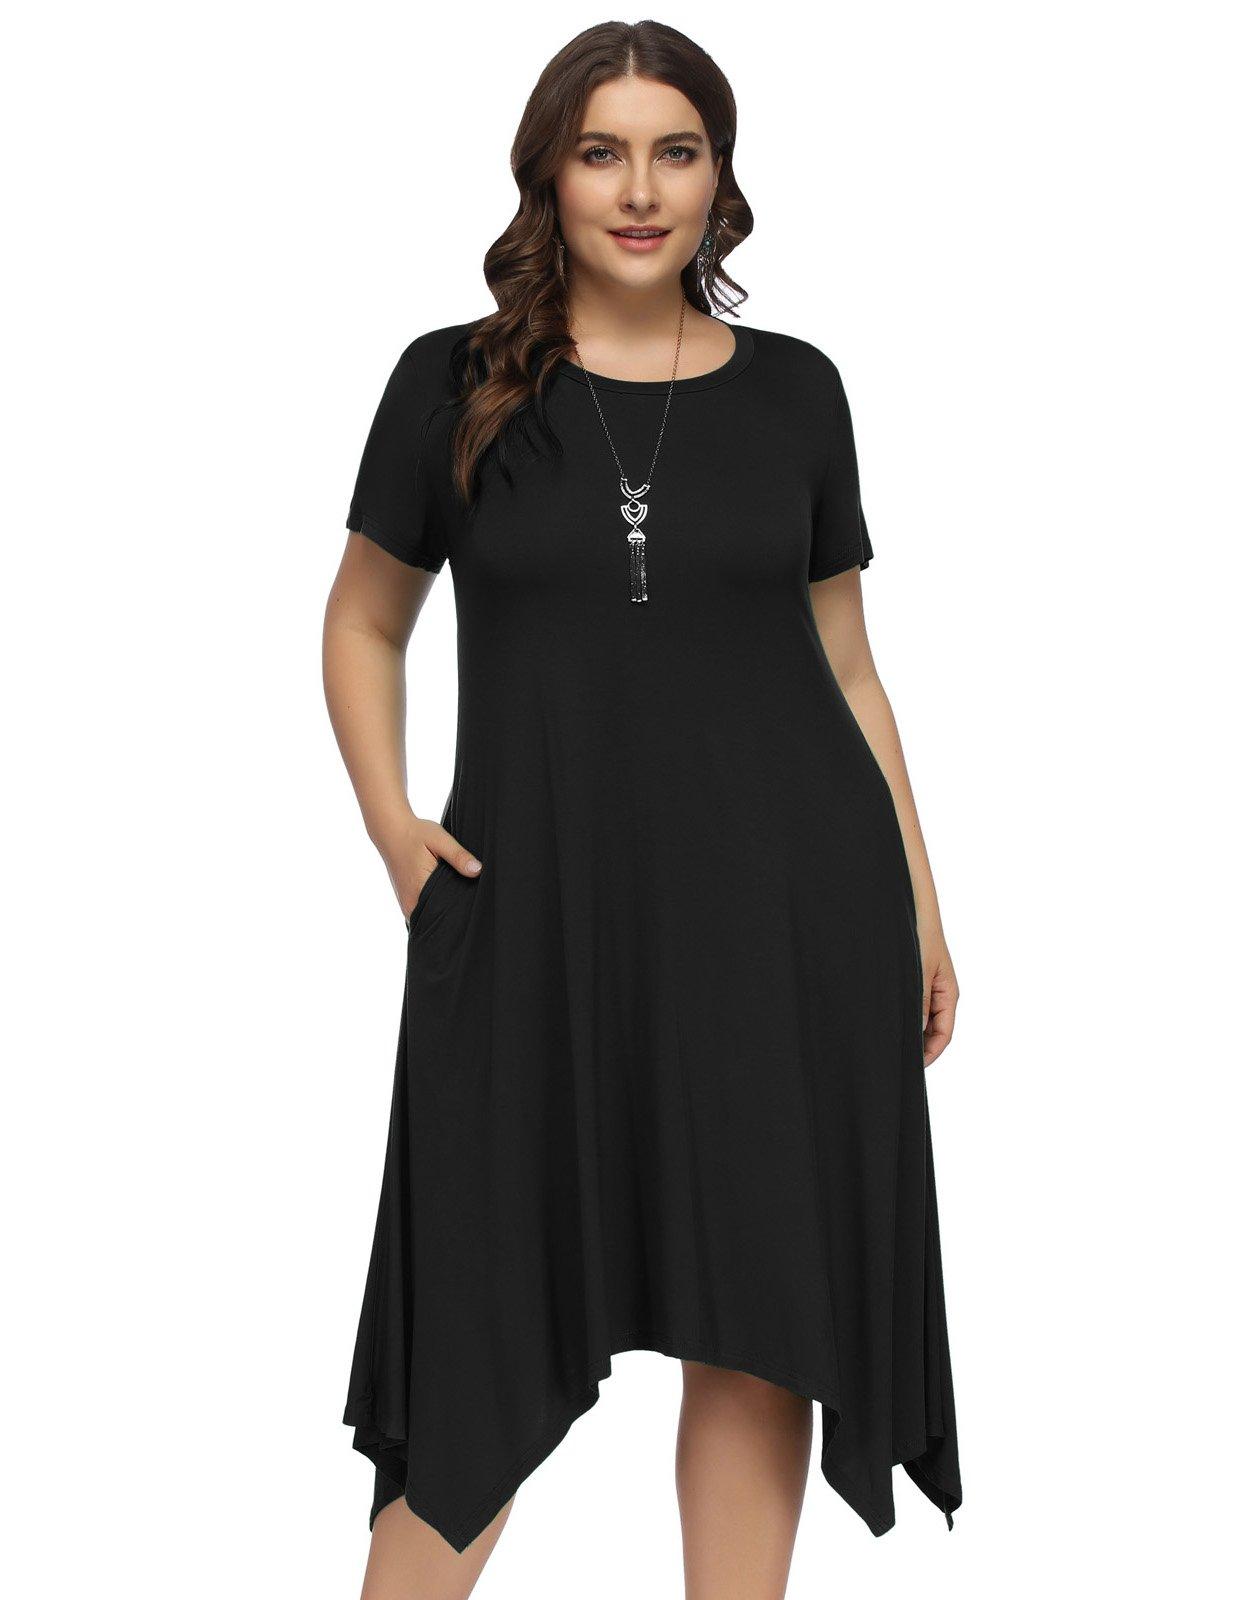 Hanna Nikole Women Summer Short Sleeve Irregular Hem Plus Size Tunic Dress Size 20W Black